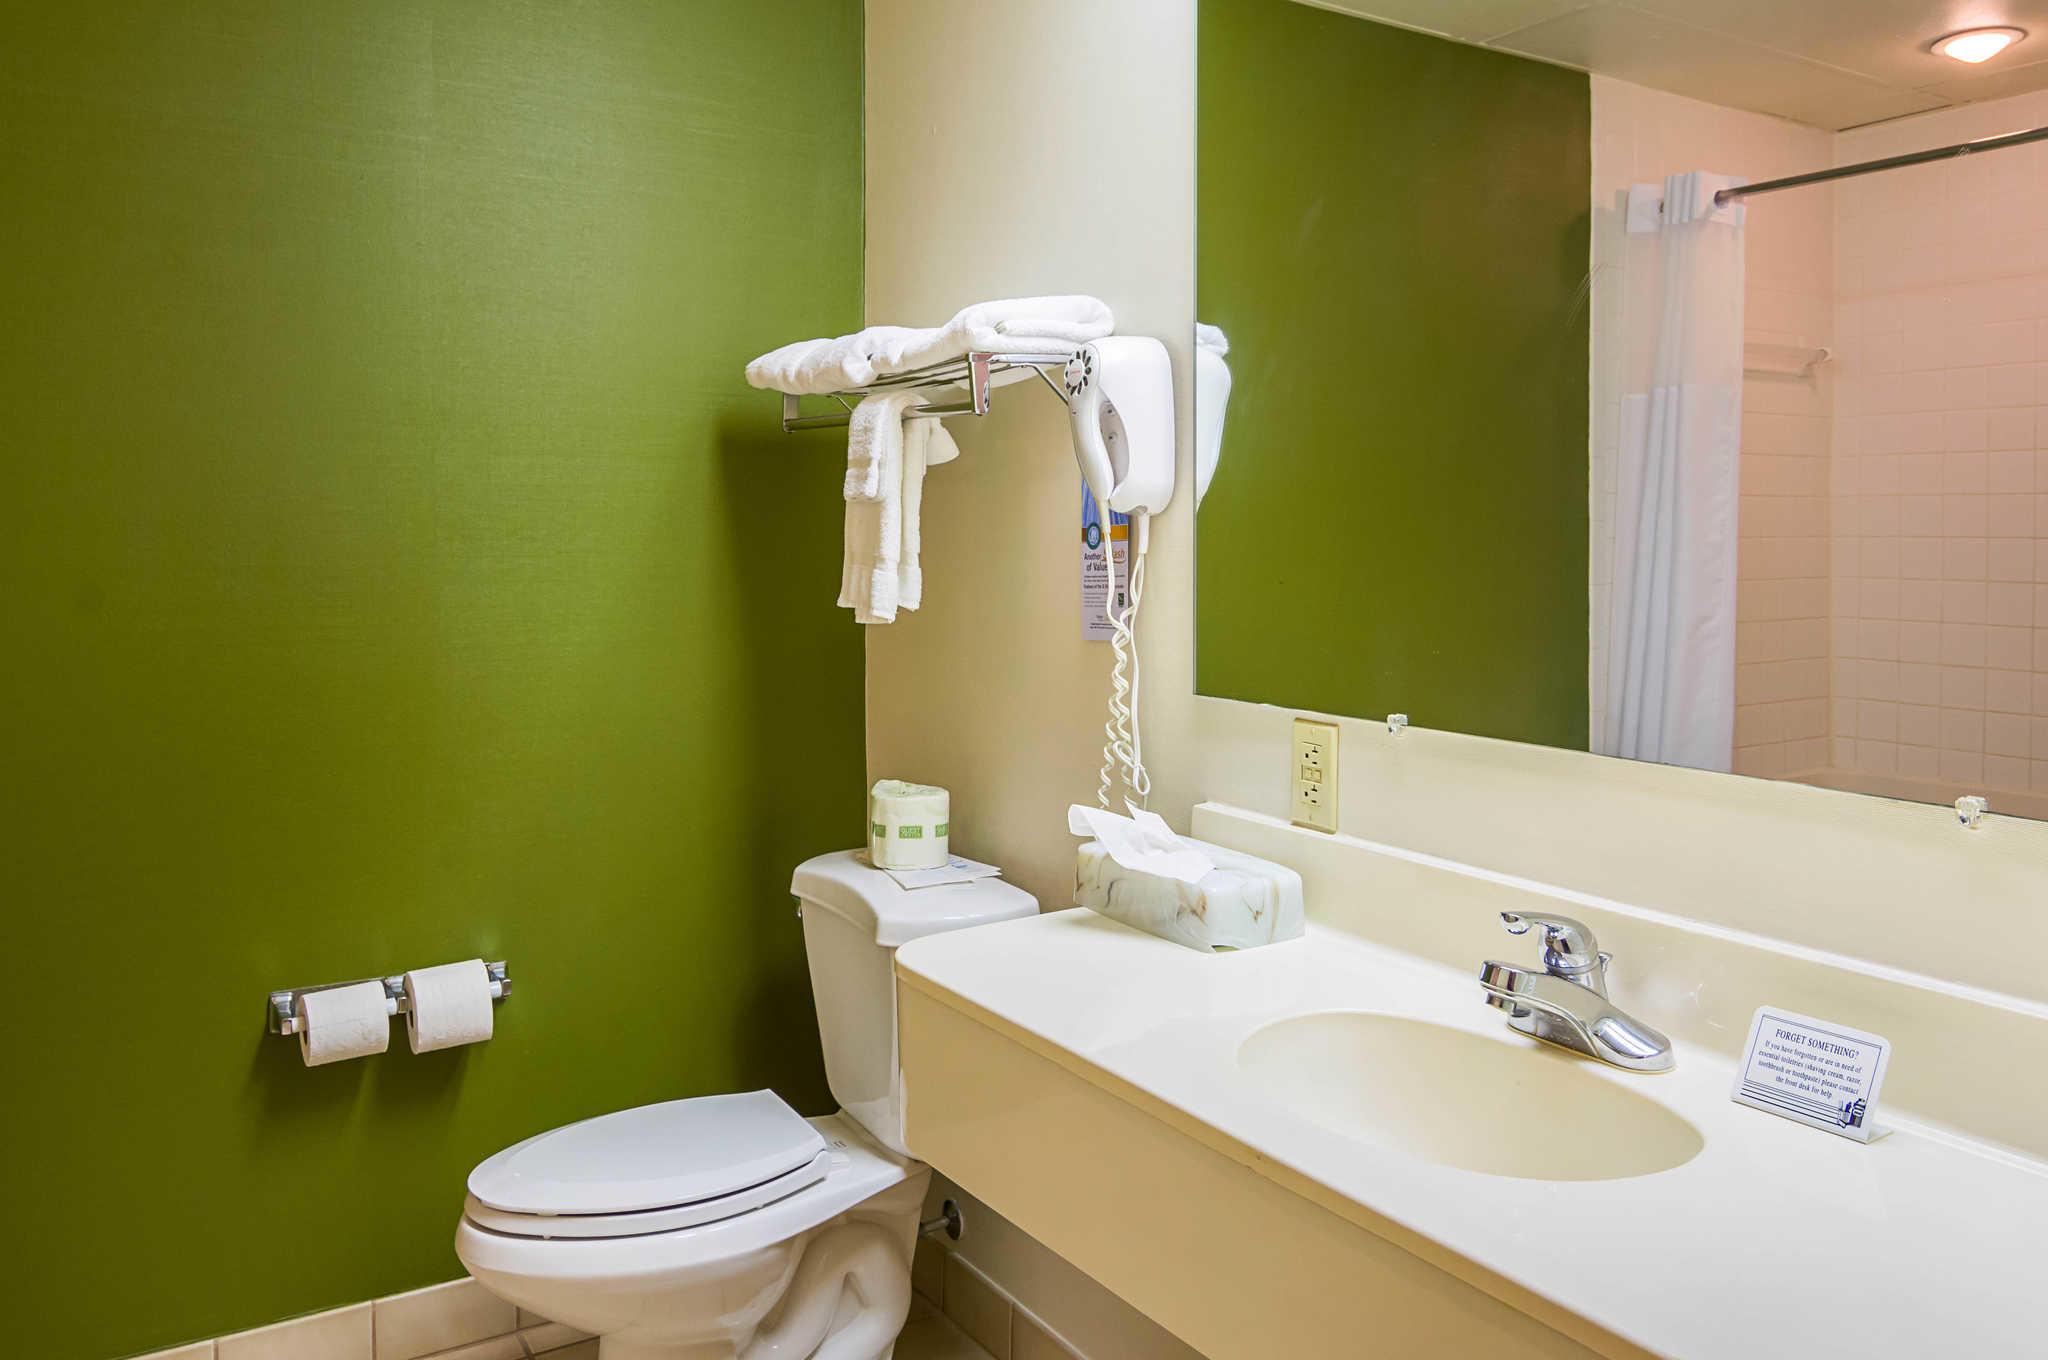 Quality Inn & Suites Kearneysville - Martinsburg image 18